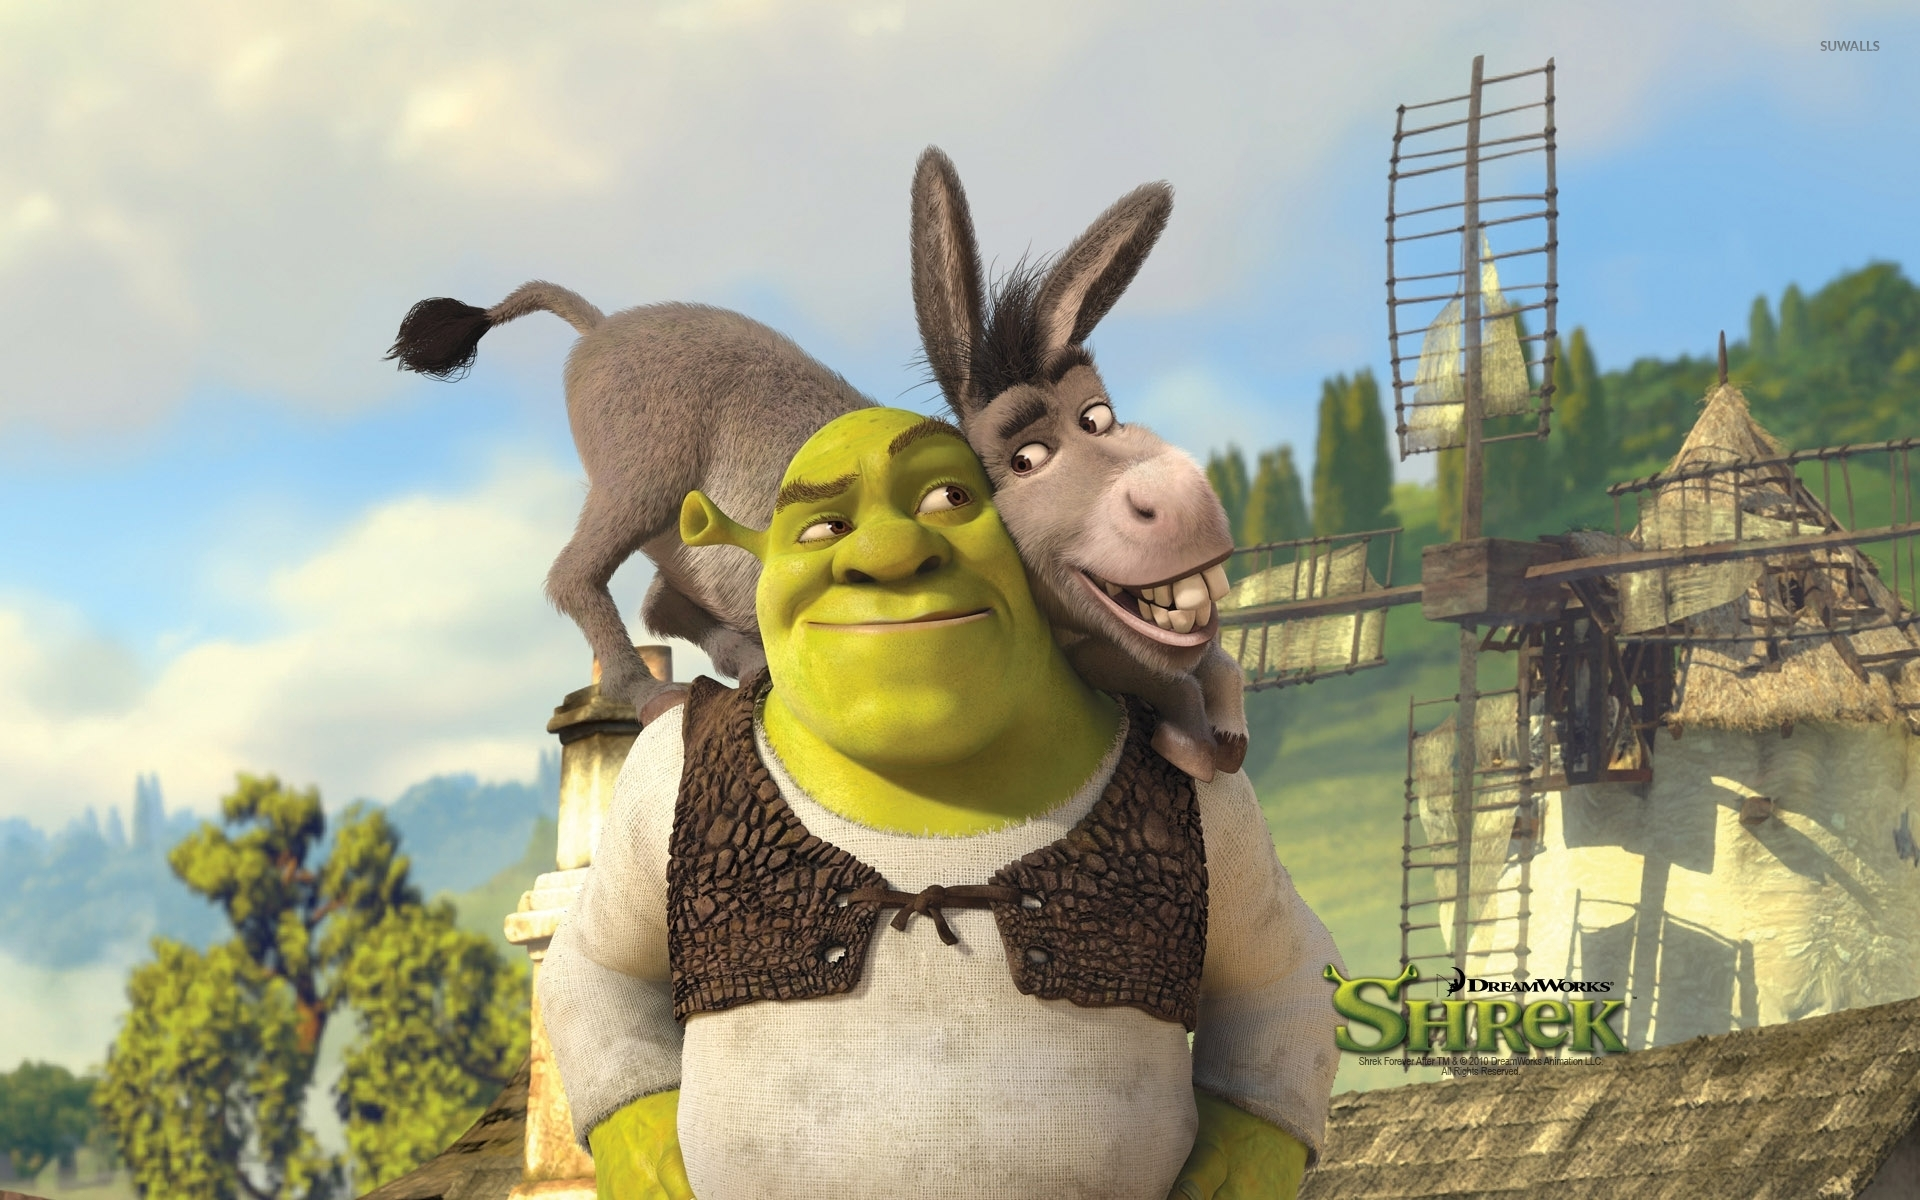 Shrek Forever After 2 Wallpaper Cartoon Wallpapers 9507